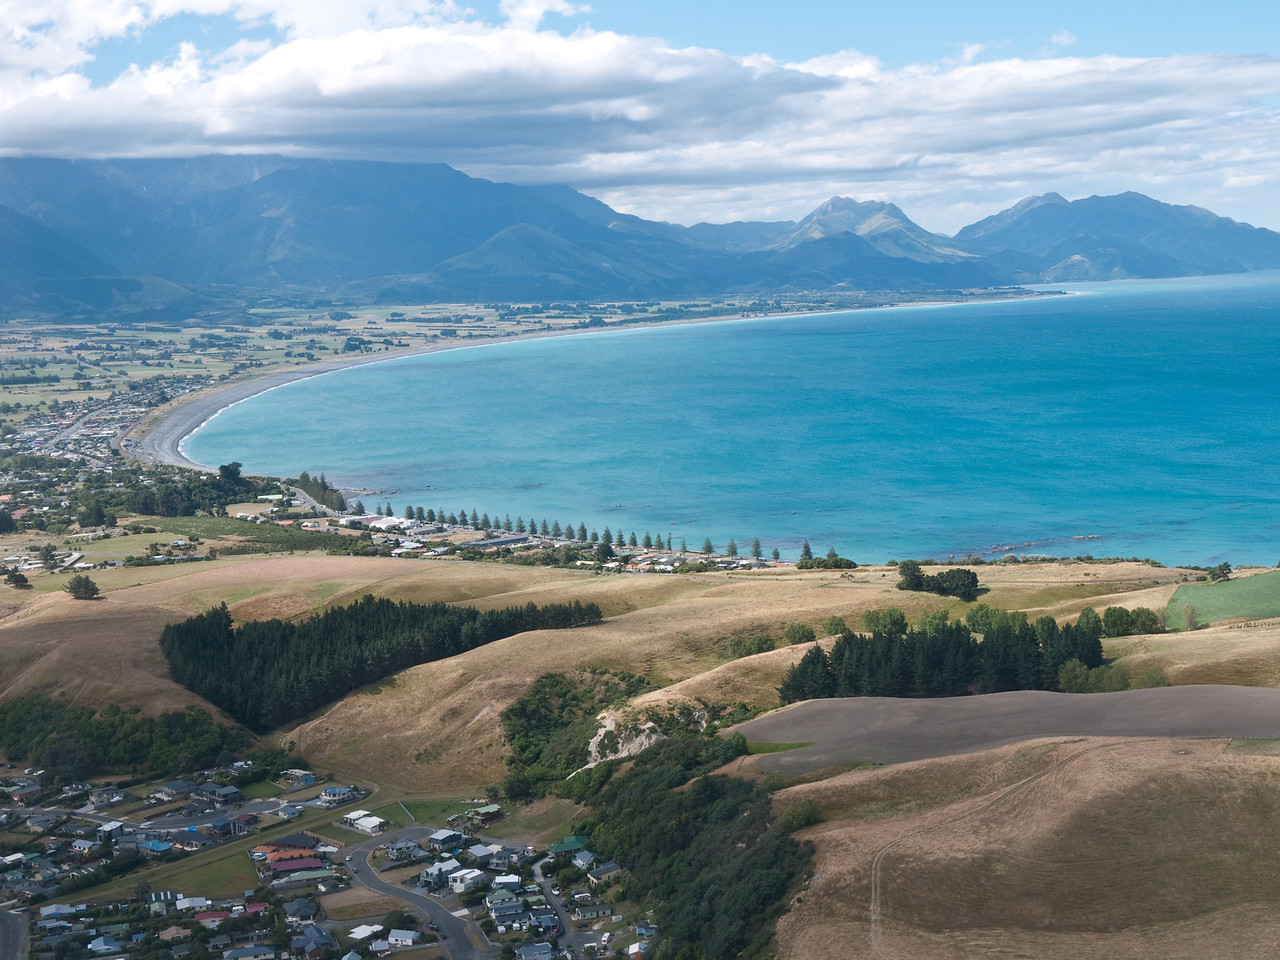 Kaikoura beachfront from the air